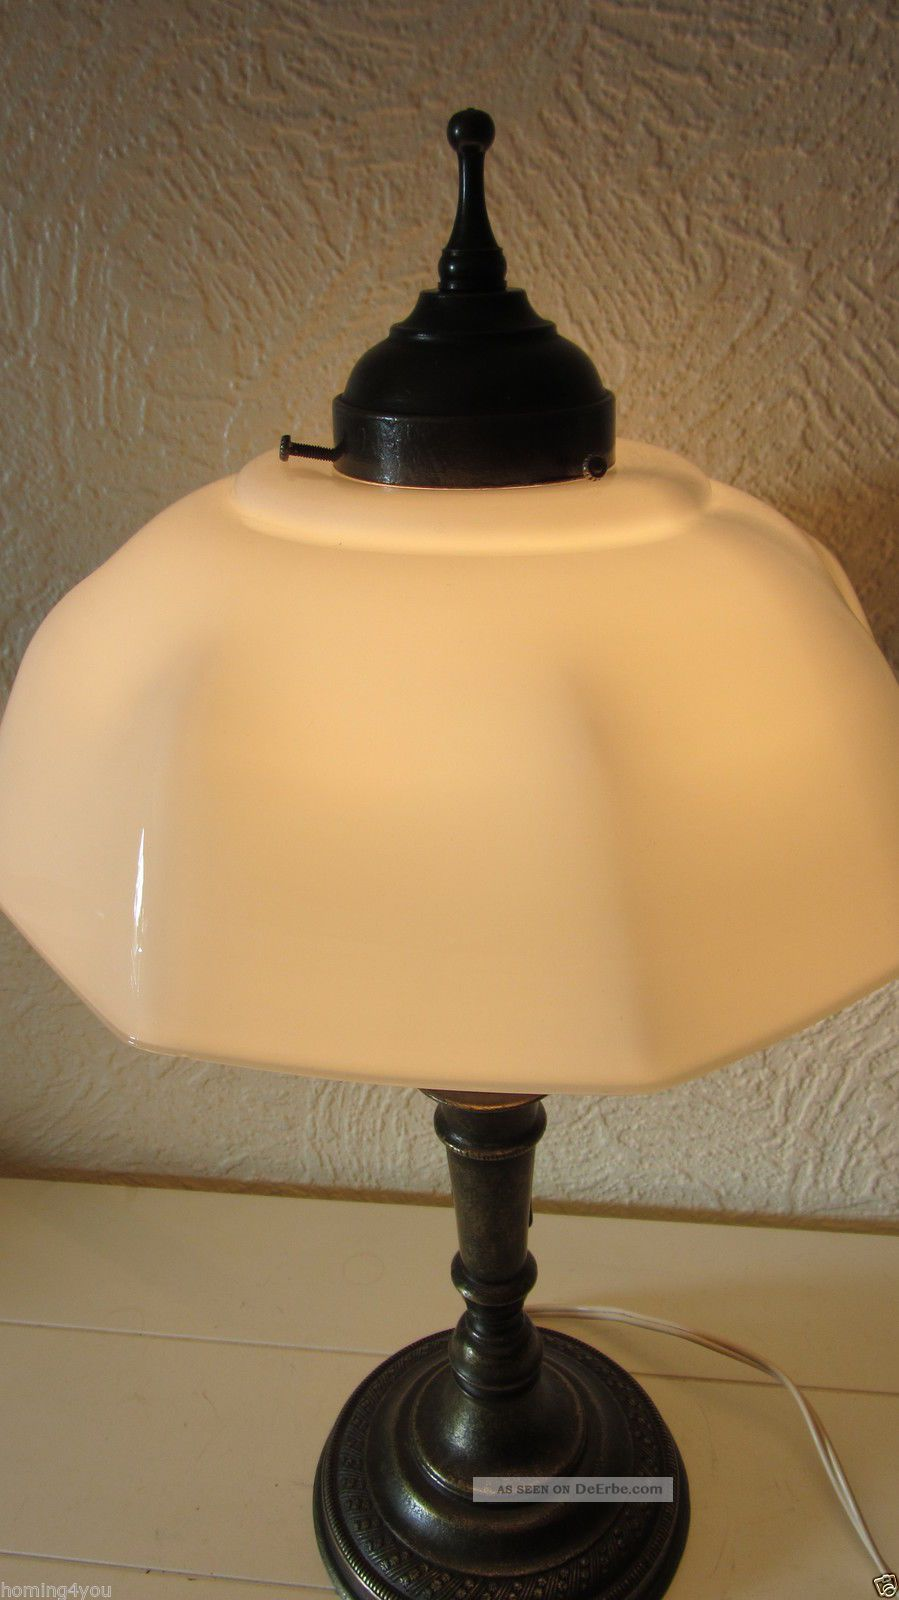 jugendstil tisch lampe b rolampe schreibtisch berlin. Black Bedroom Furniture Sets. Home Design Ideas